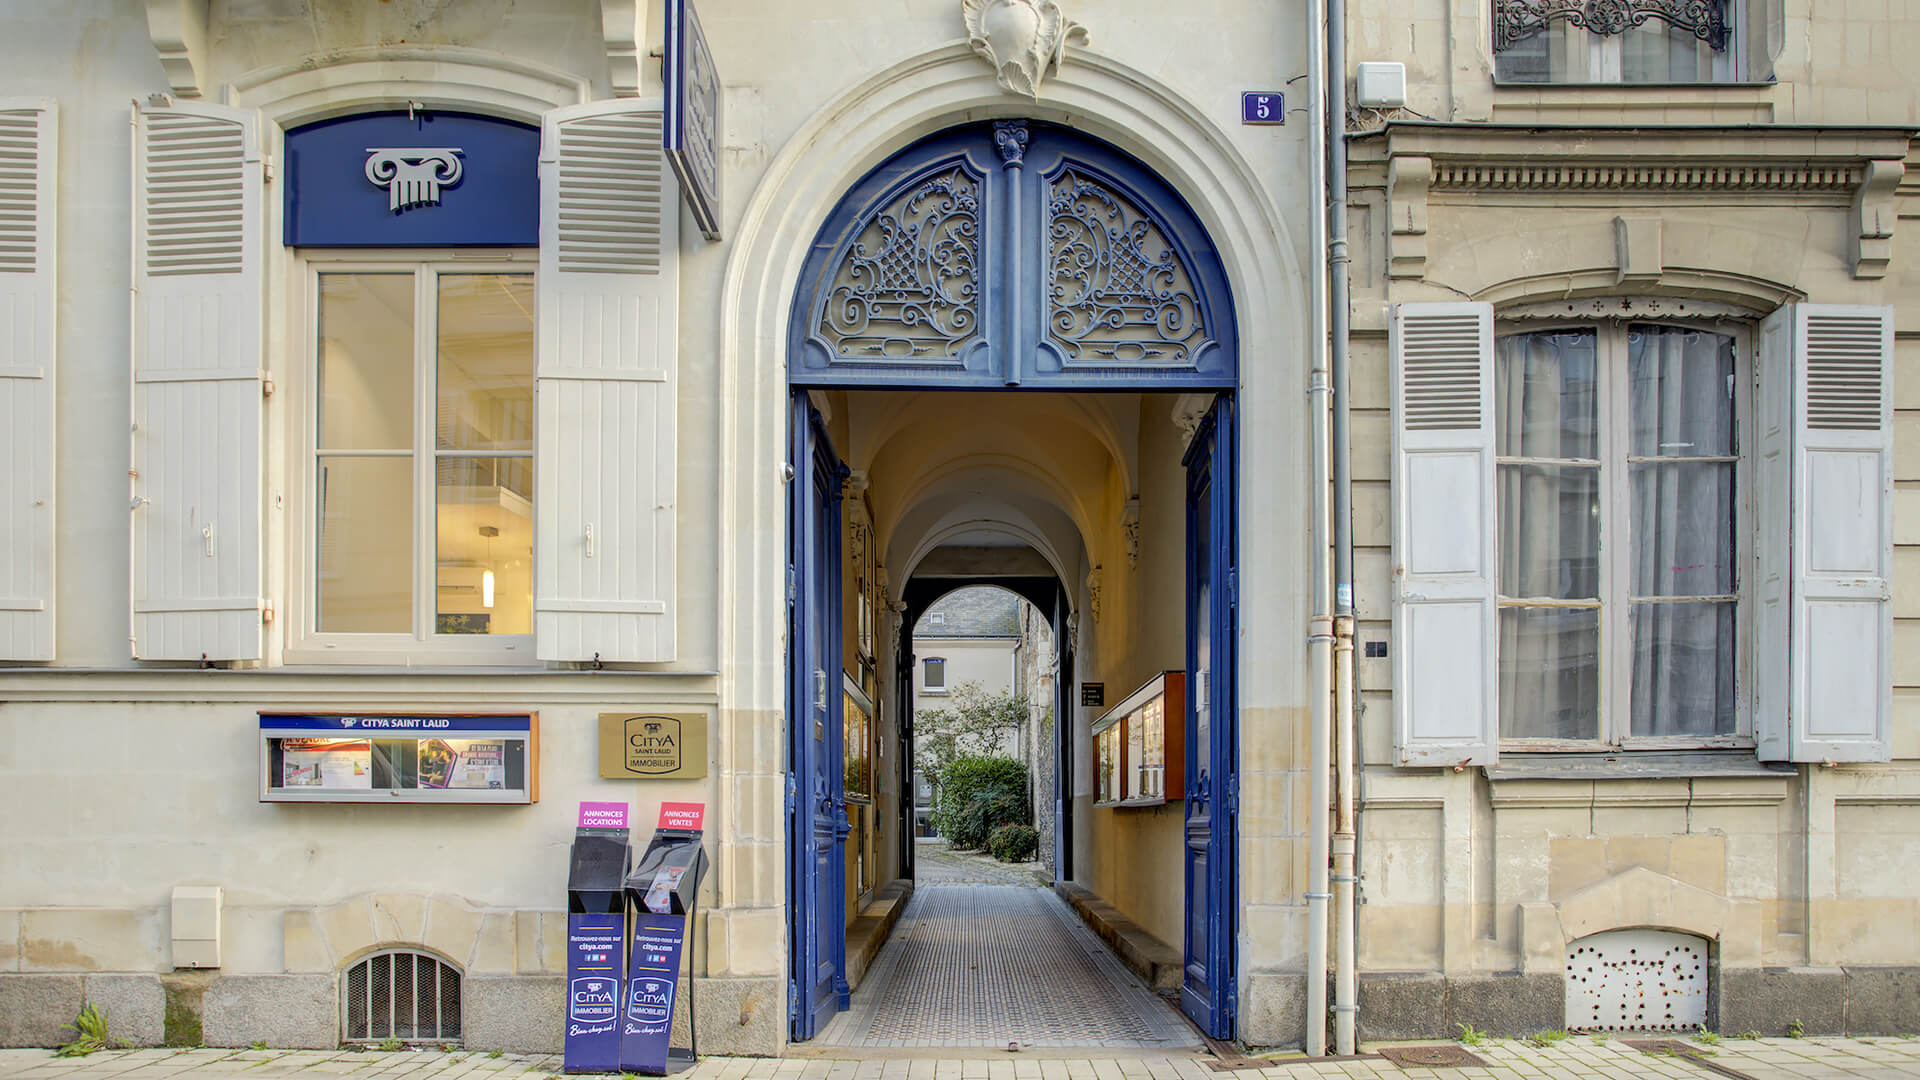 Agence immo Citya Saint Laud